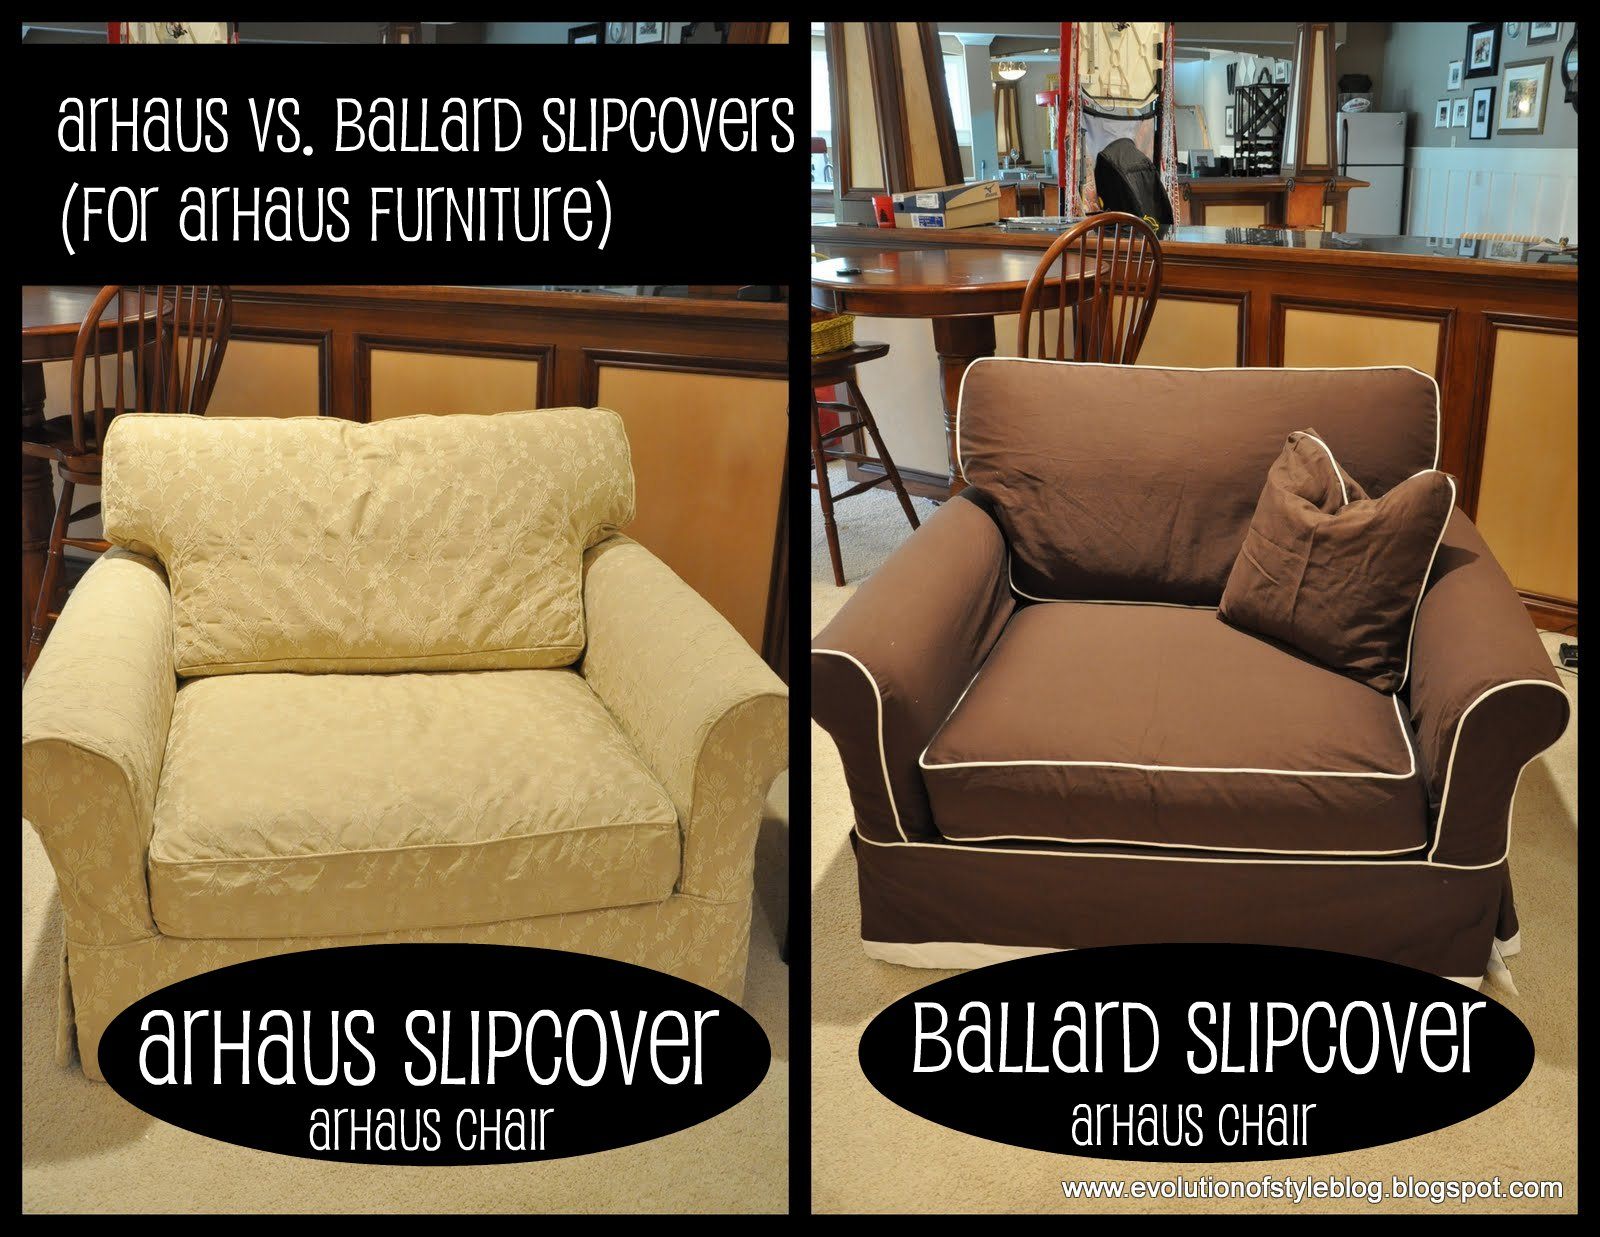 Slipcovers Arhaus Vs Ballard Evolution Of Style